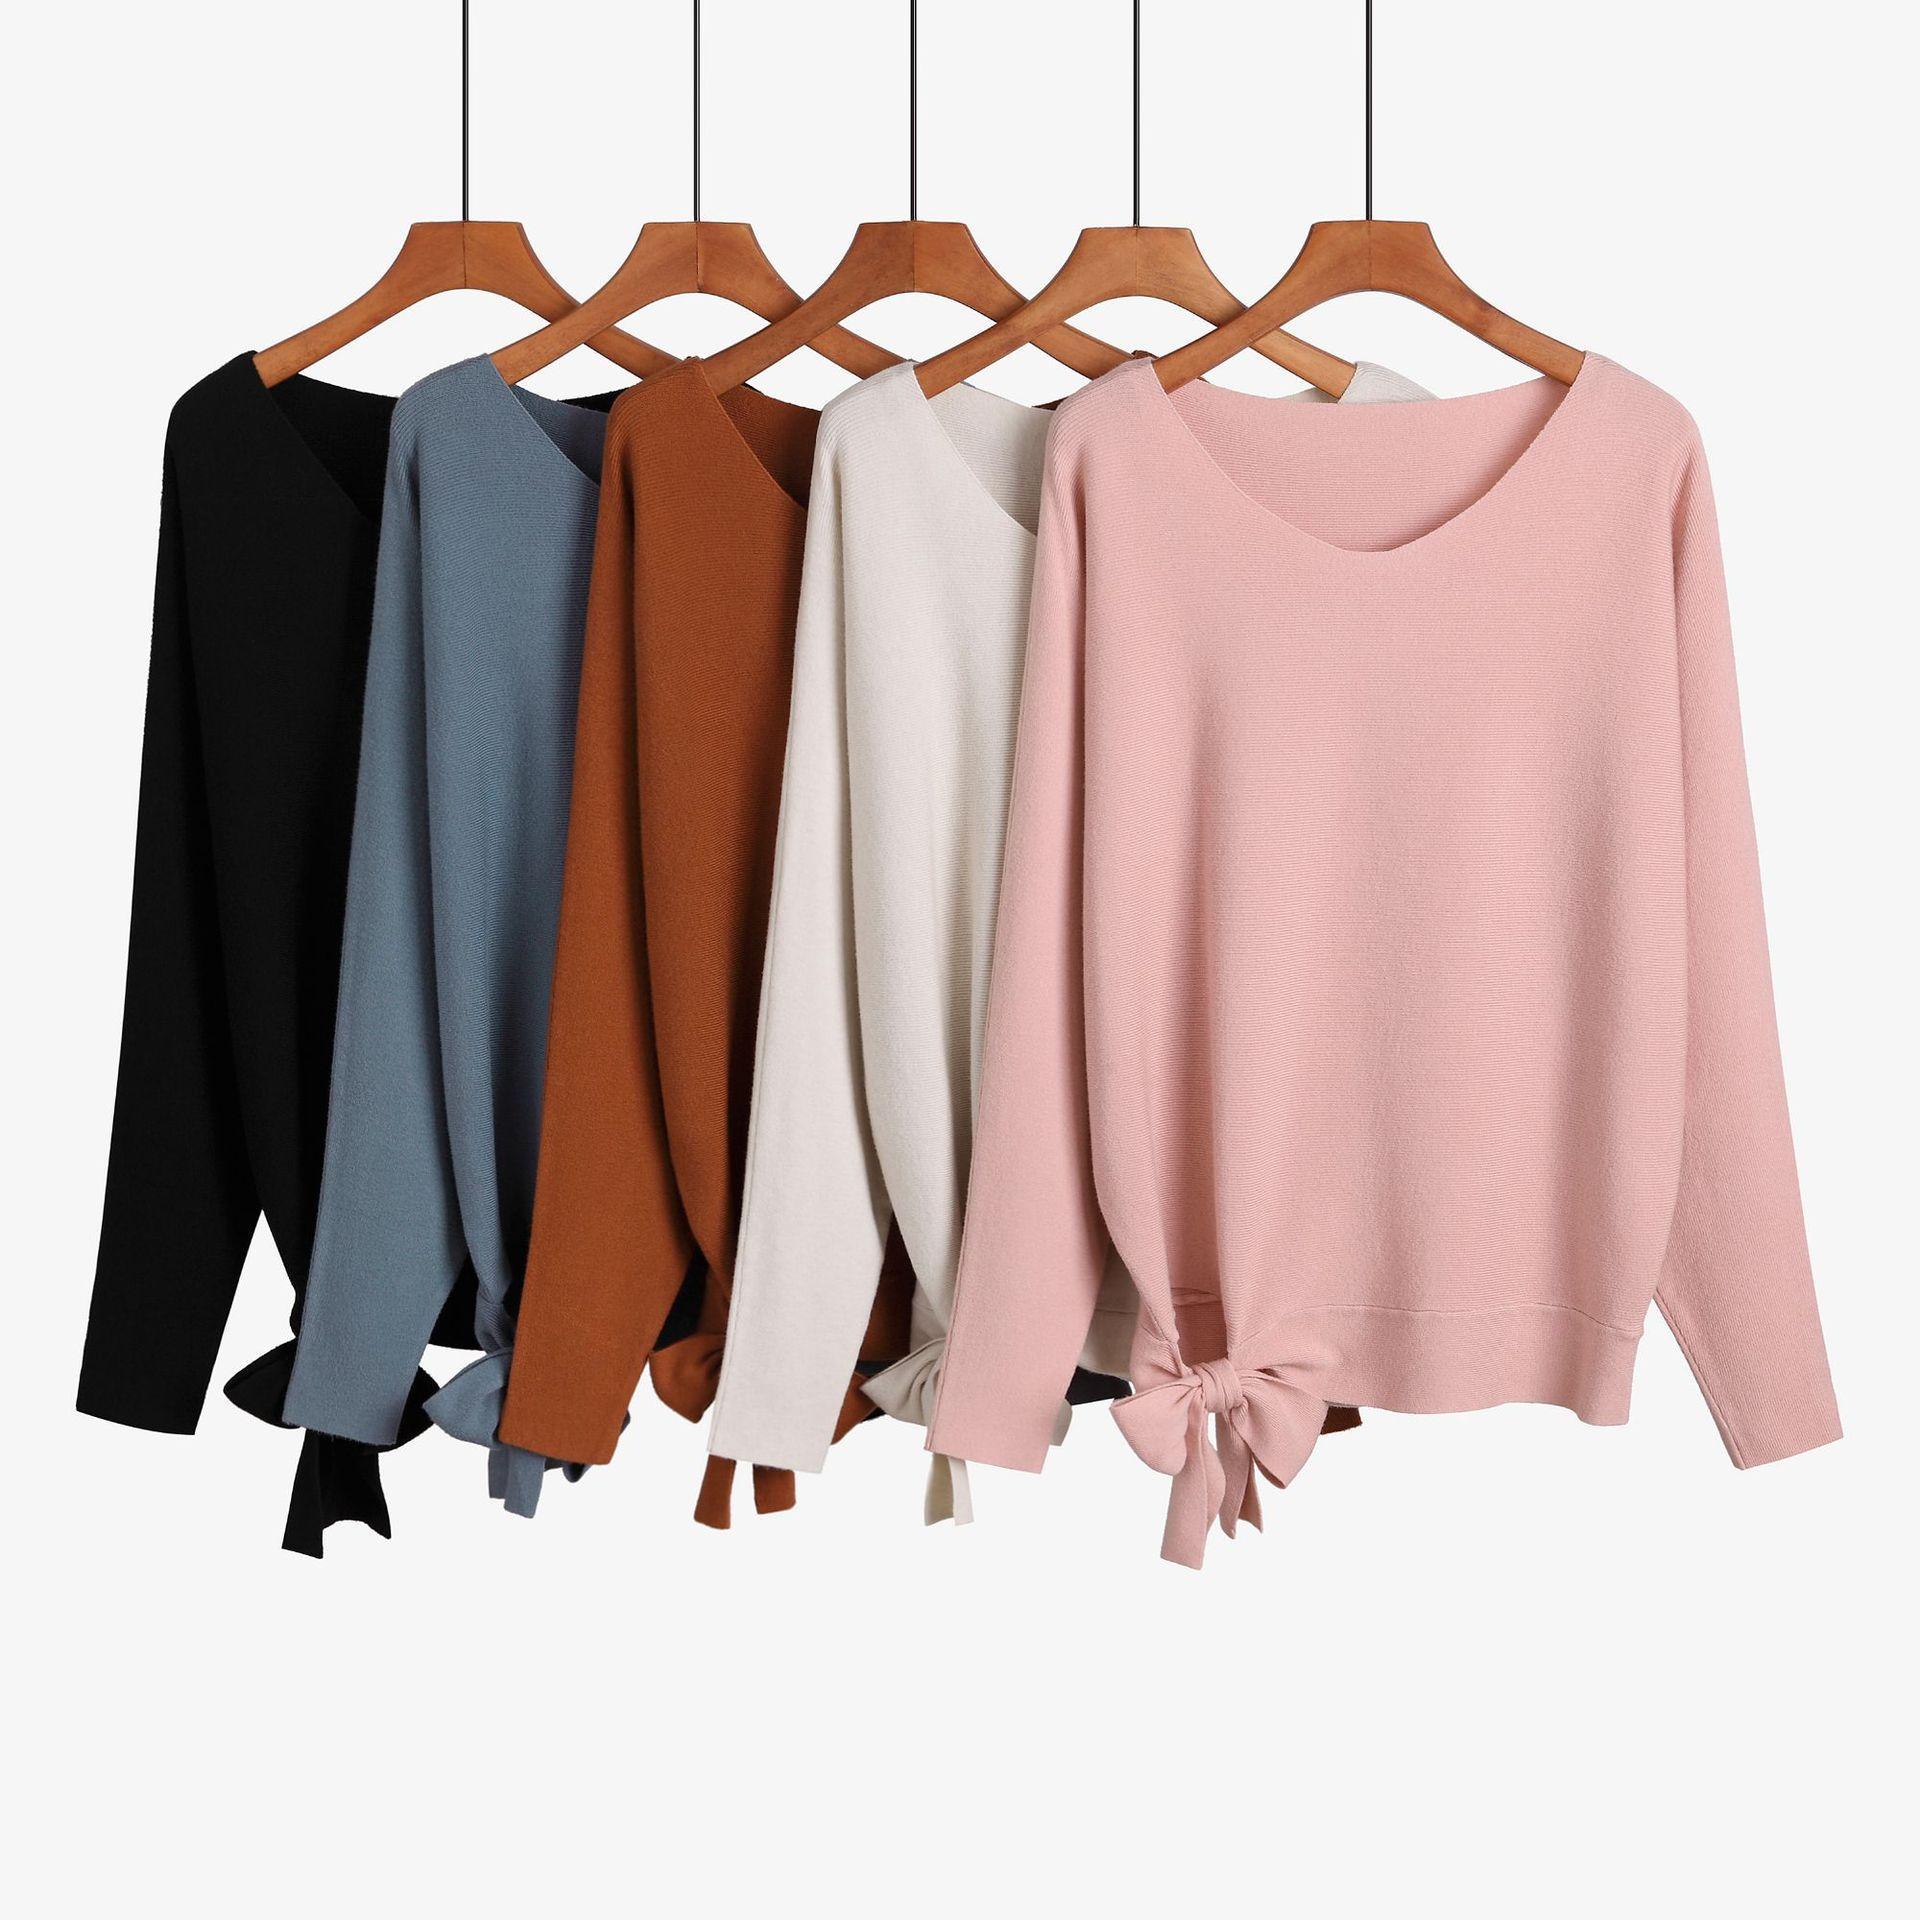 GCDS Jacquard Ropa de mujer Cashmere suéter encaje, holgado, sobredimensionado, jersey jersey bate superior